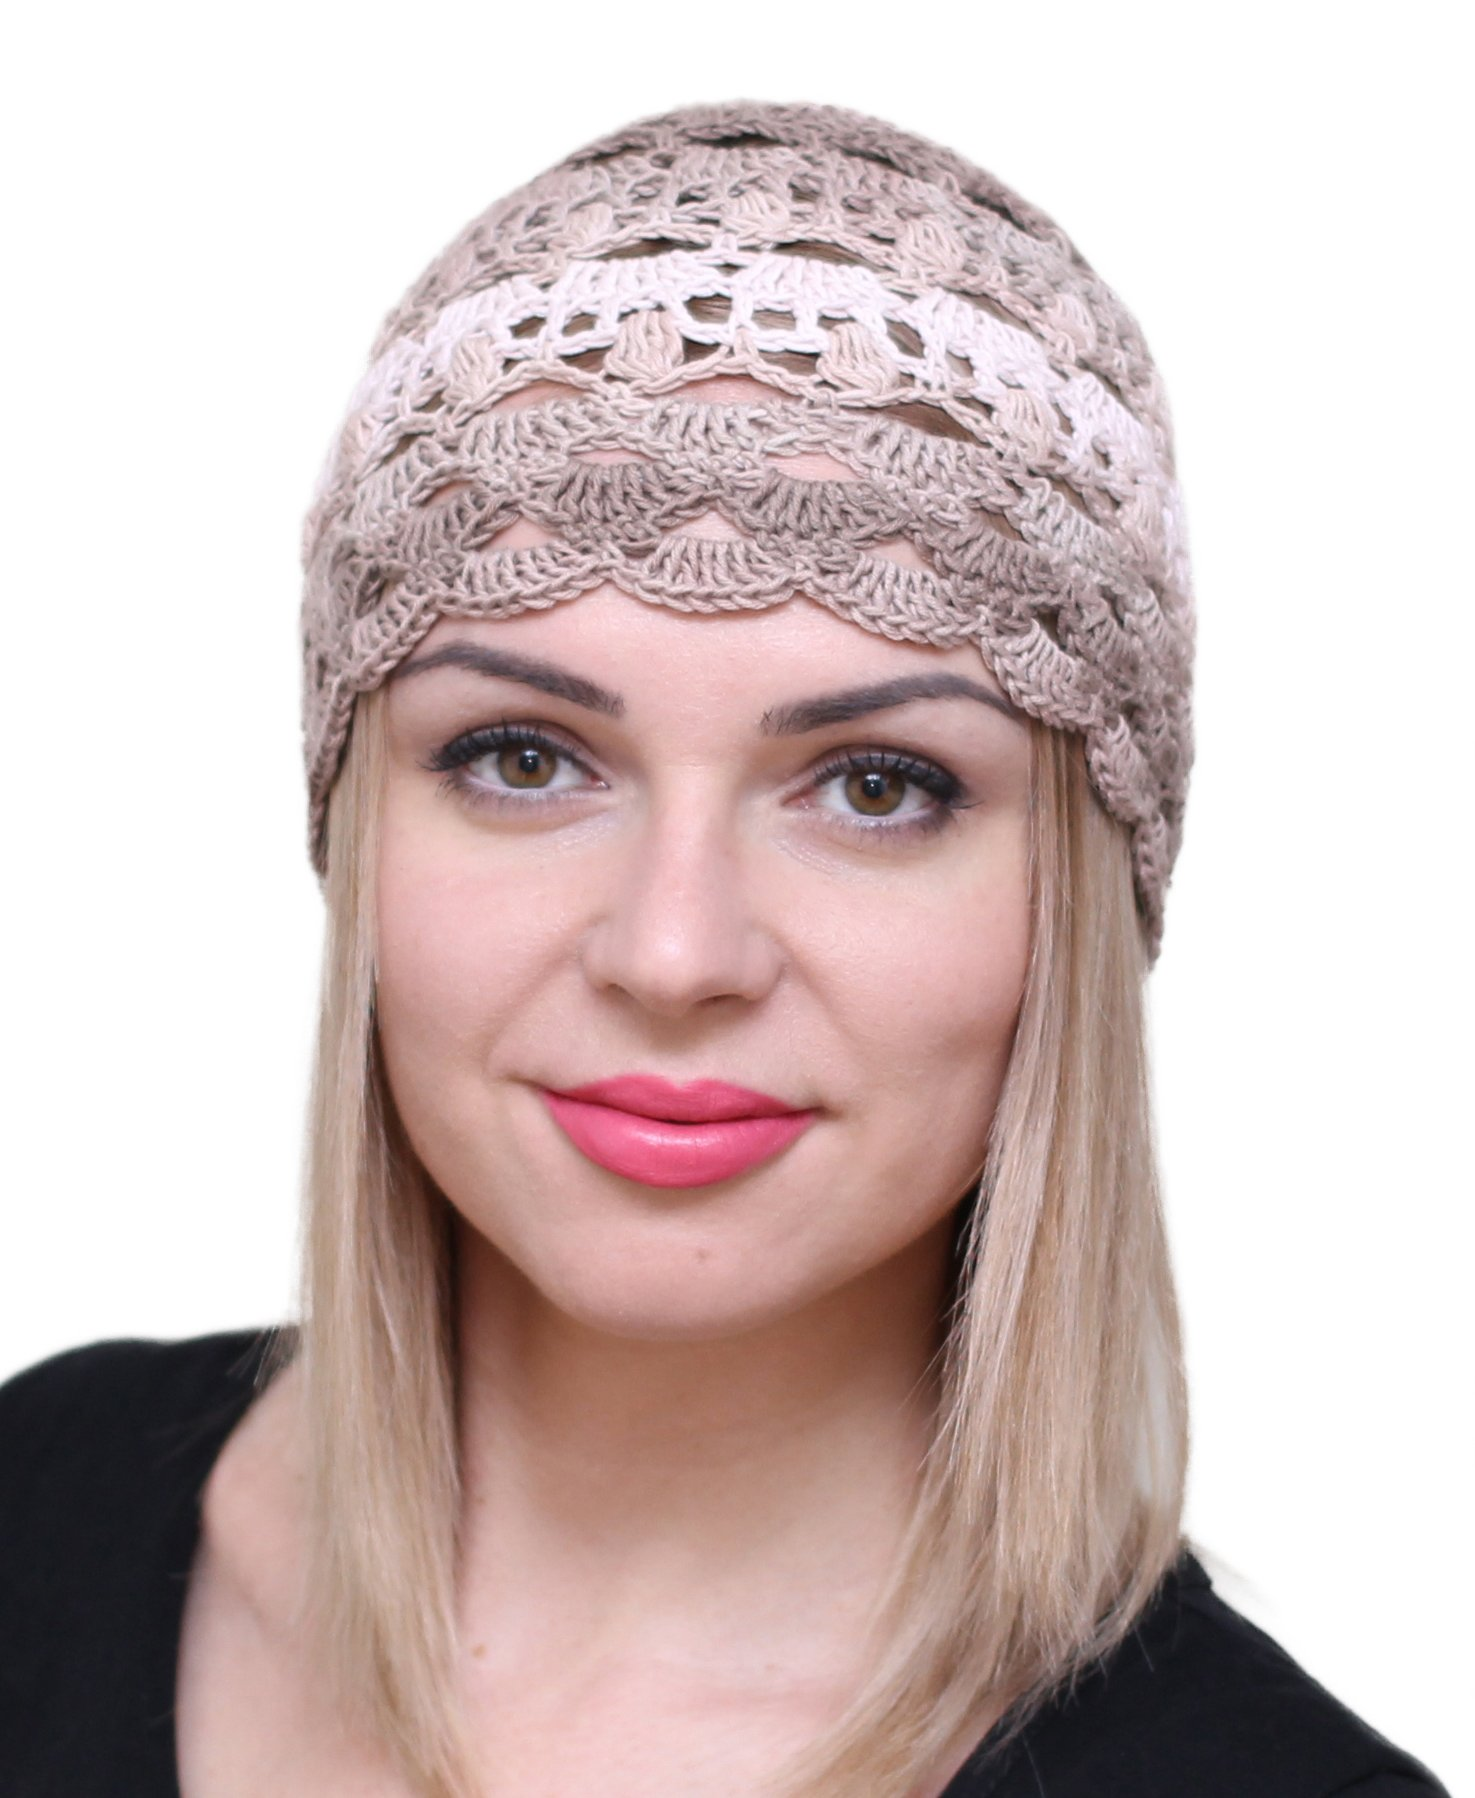 NFB Fascinator Hats for Women Ladies Summer Beanie Cotton Cloche Crochet caps (Сappuccino)